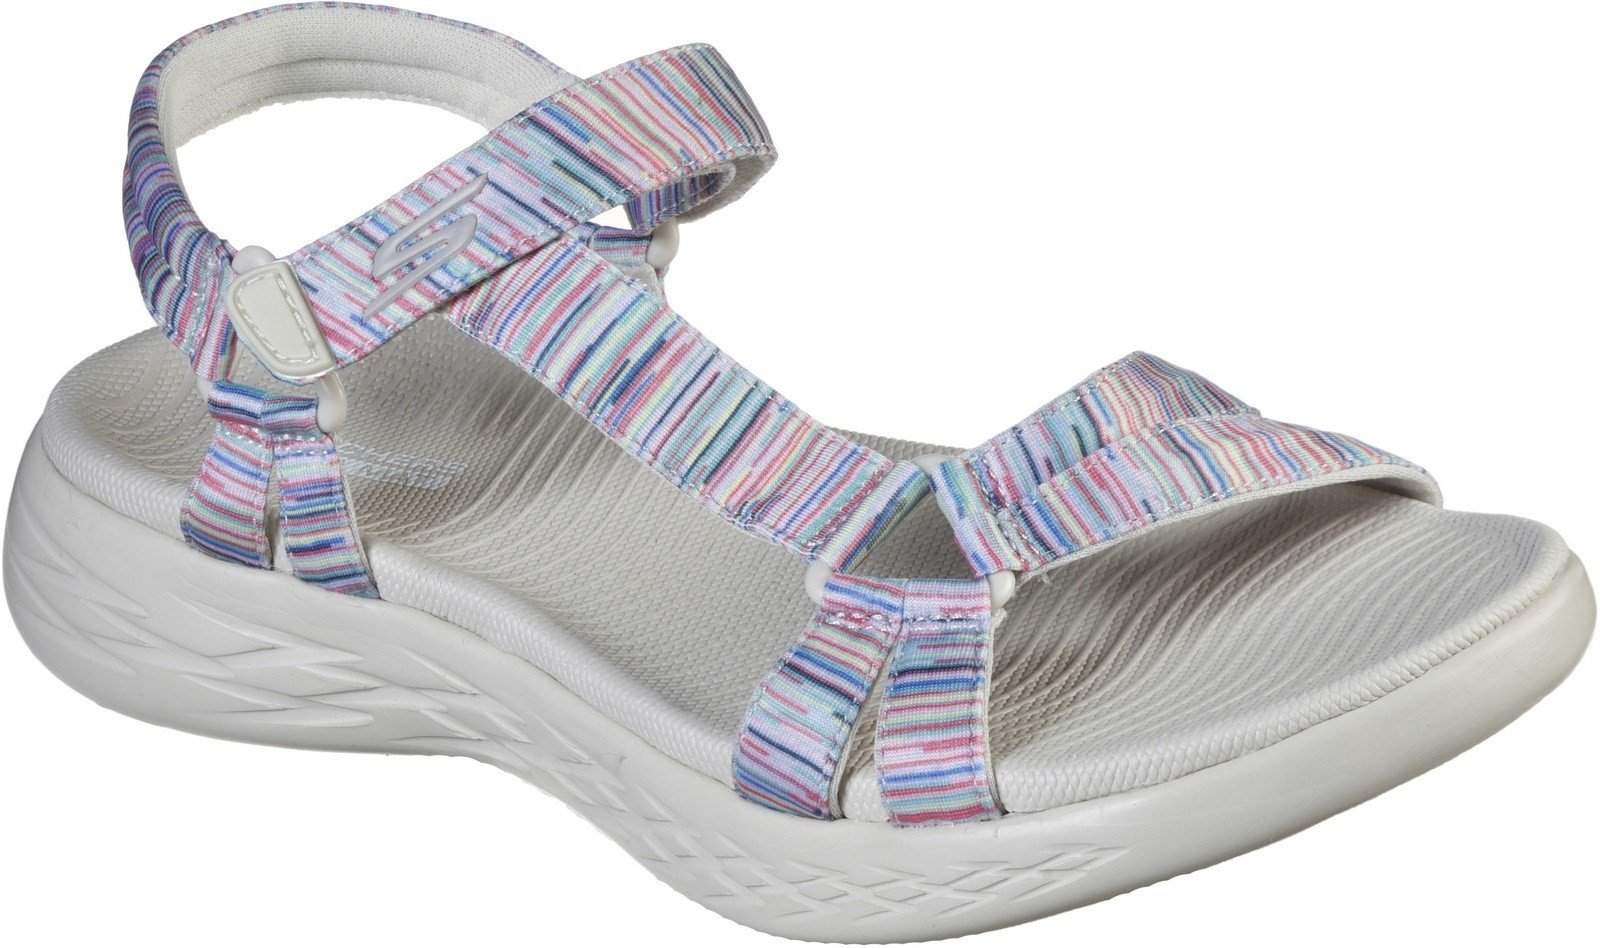 Skechers Women's On The Go Sandal Various Colours 30353 - Natural/Multicoloured 3